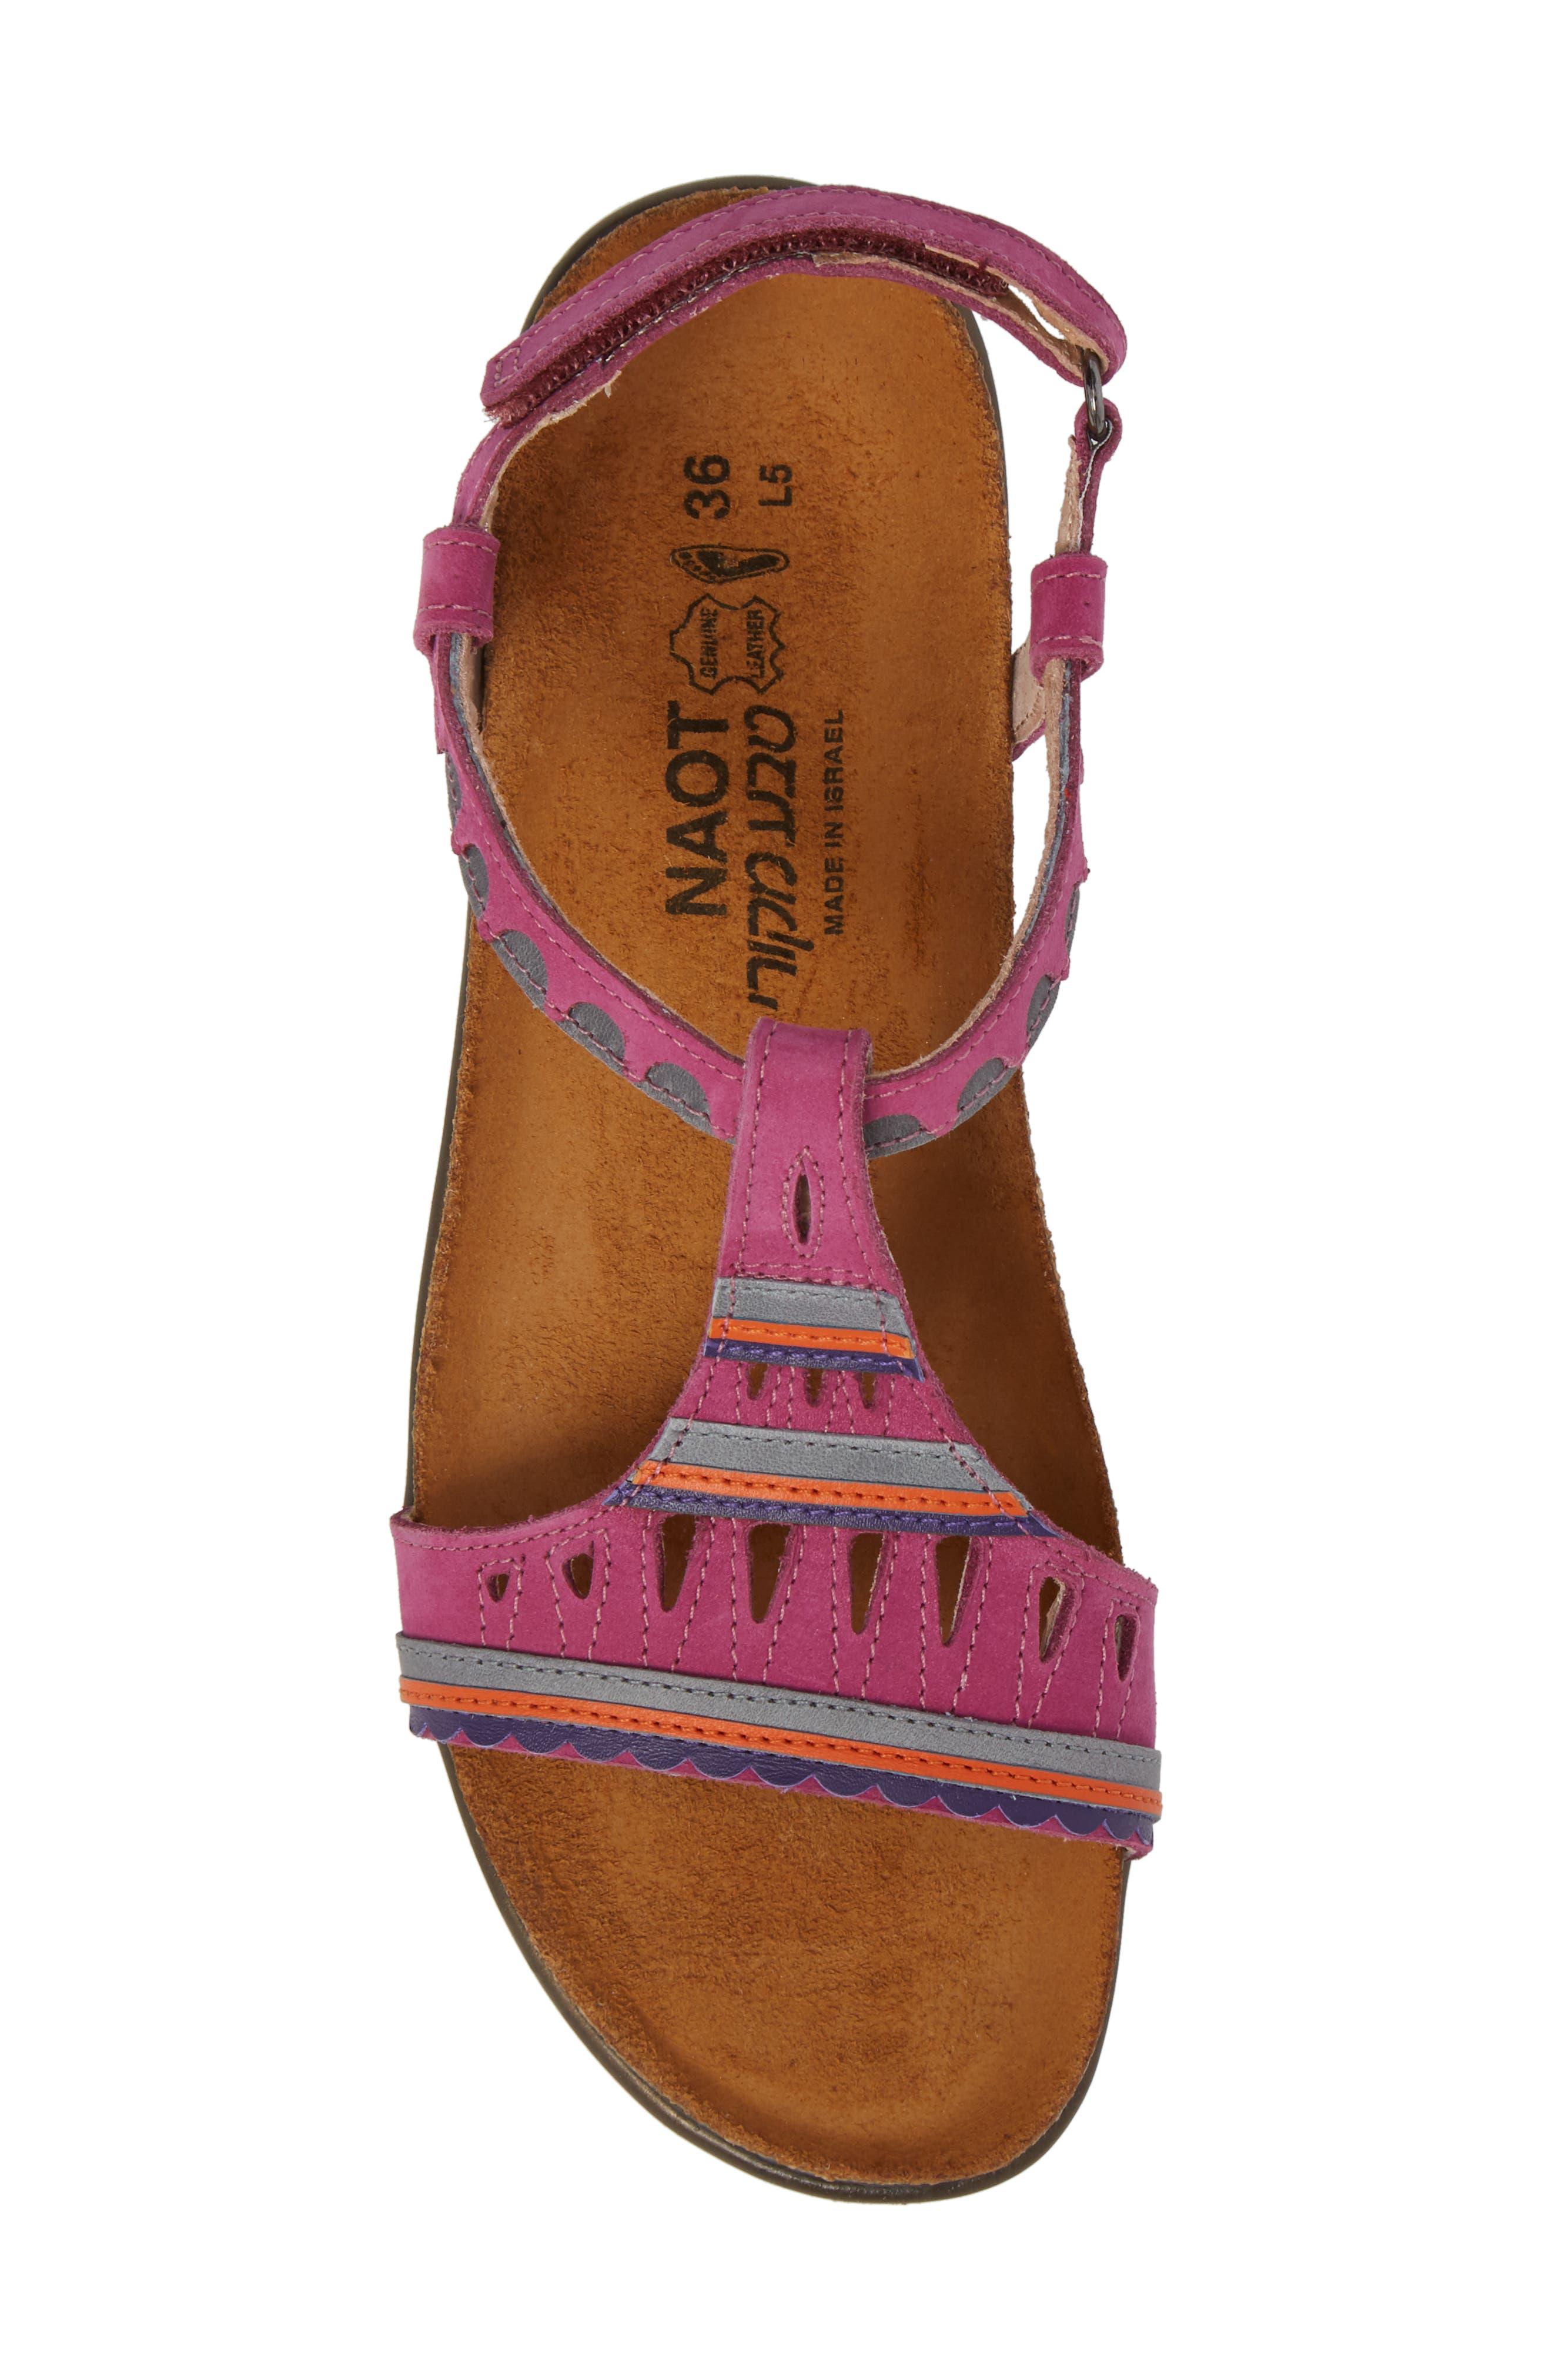 NAOT, Odelia Perforated T-Strap Sandal, Alternate thumbnail 5, color, PINK PLUM NUBUCK